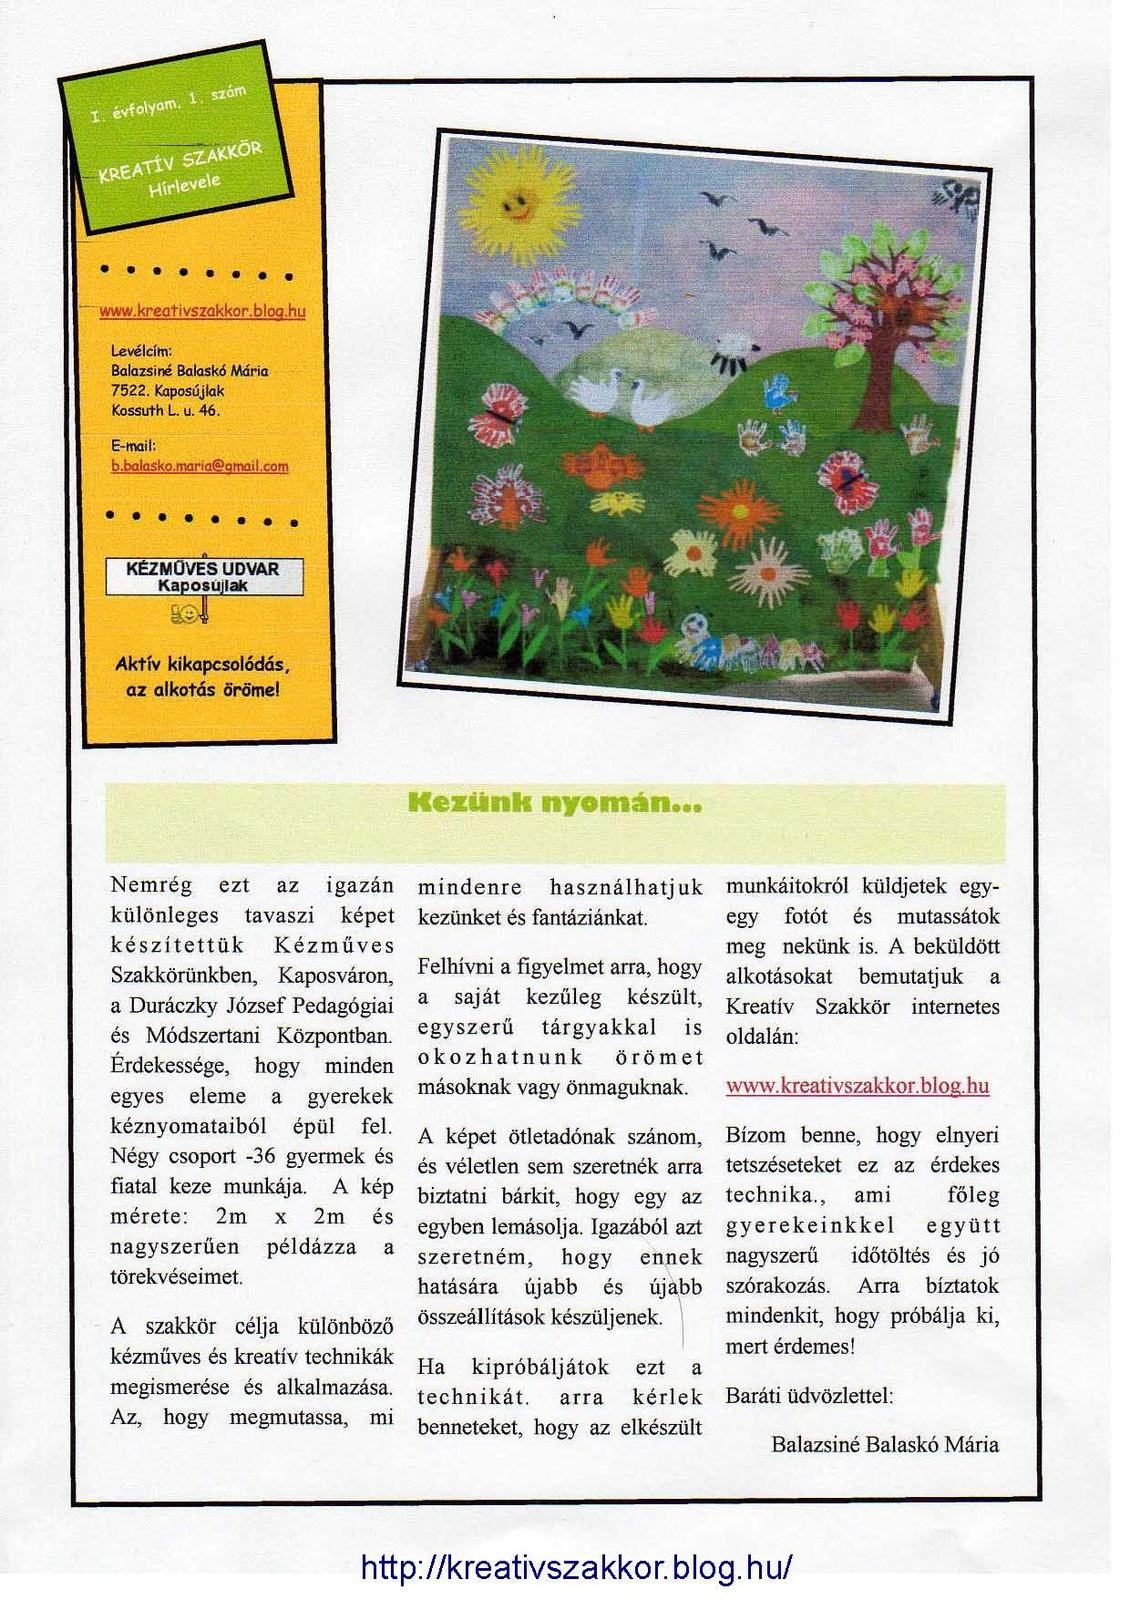 B.B.M: KREATÍV SZAKKÖR Hírlevele 1-1 Page 4